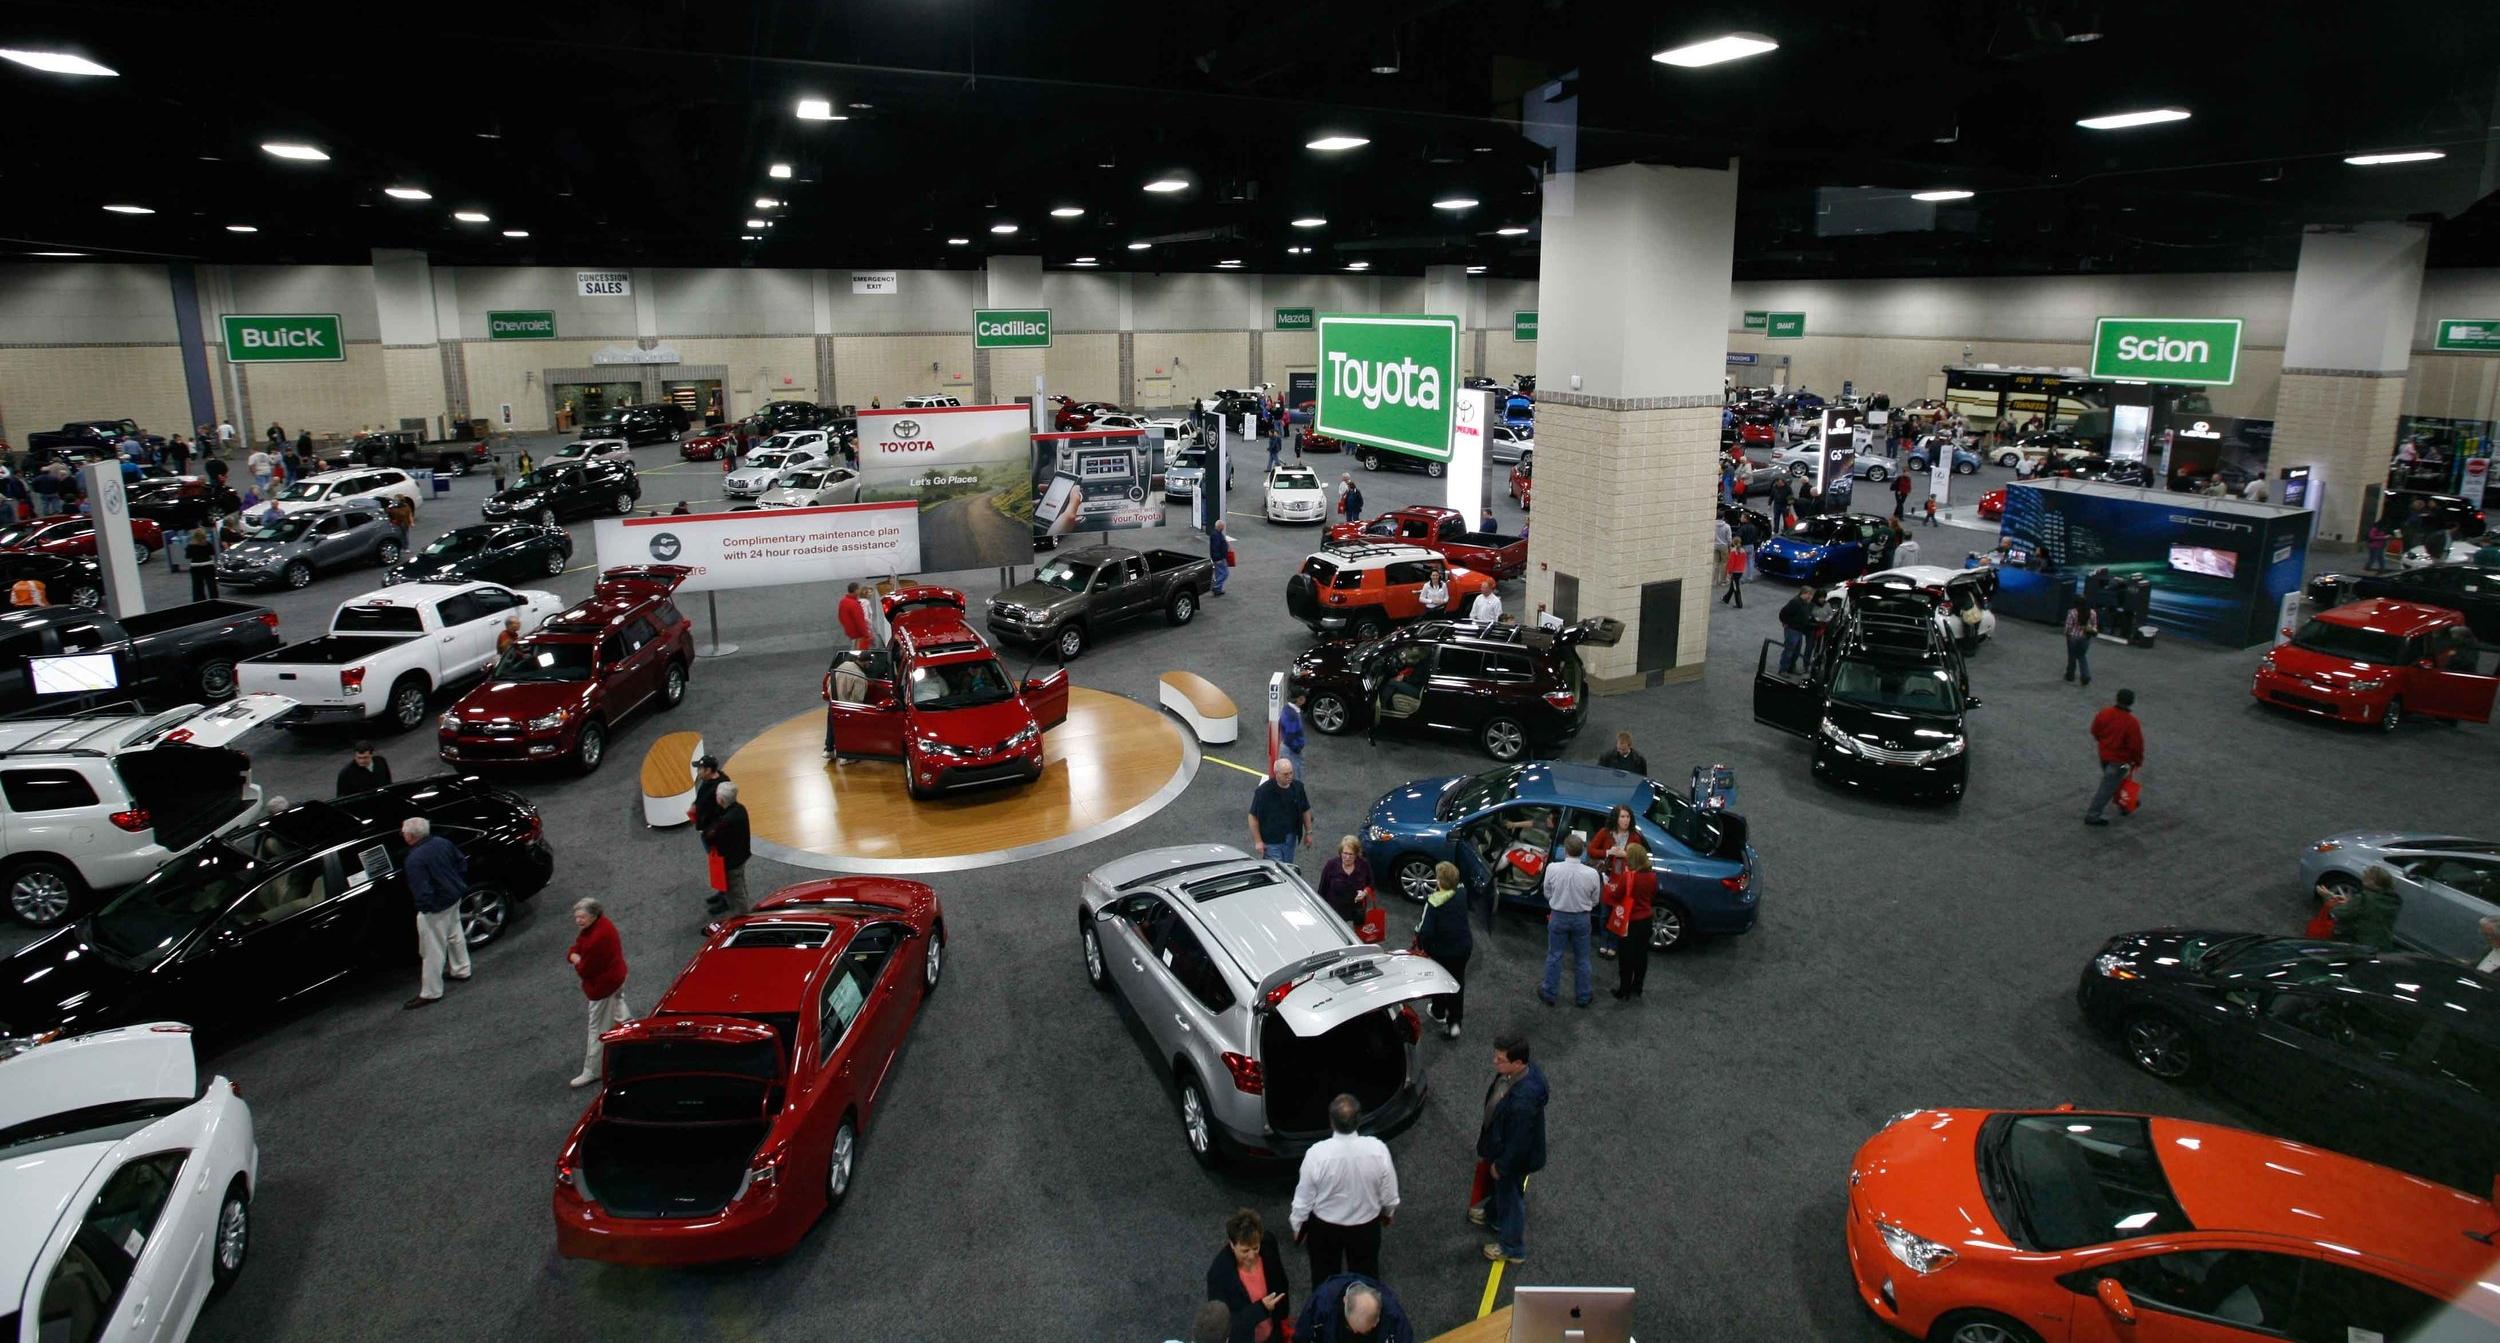 Knox News Auto Show - Automotive convention